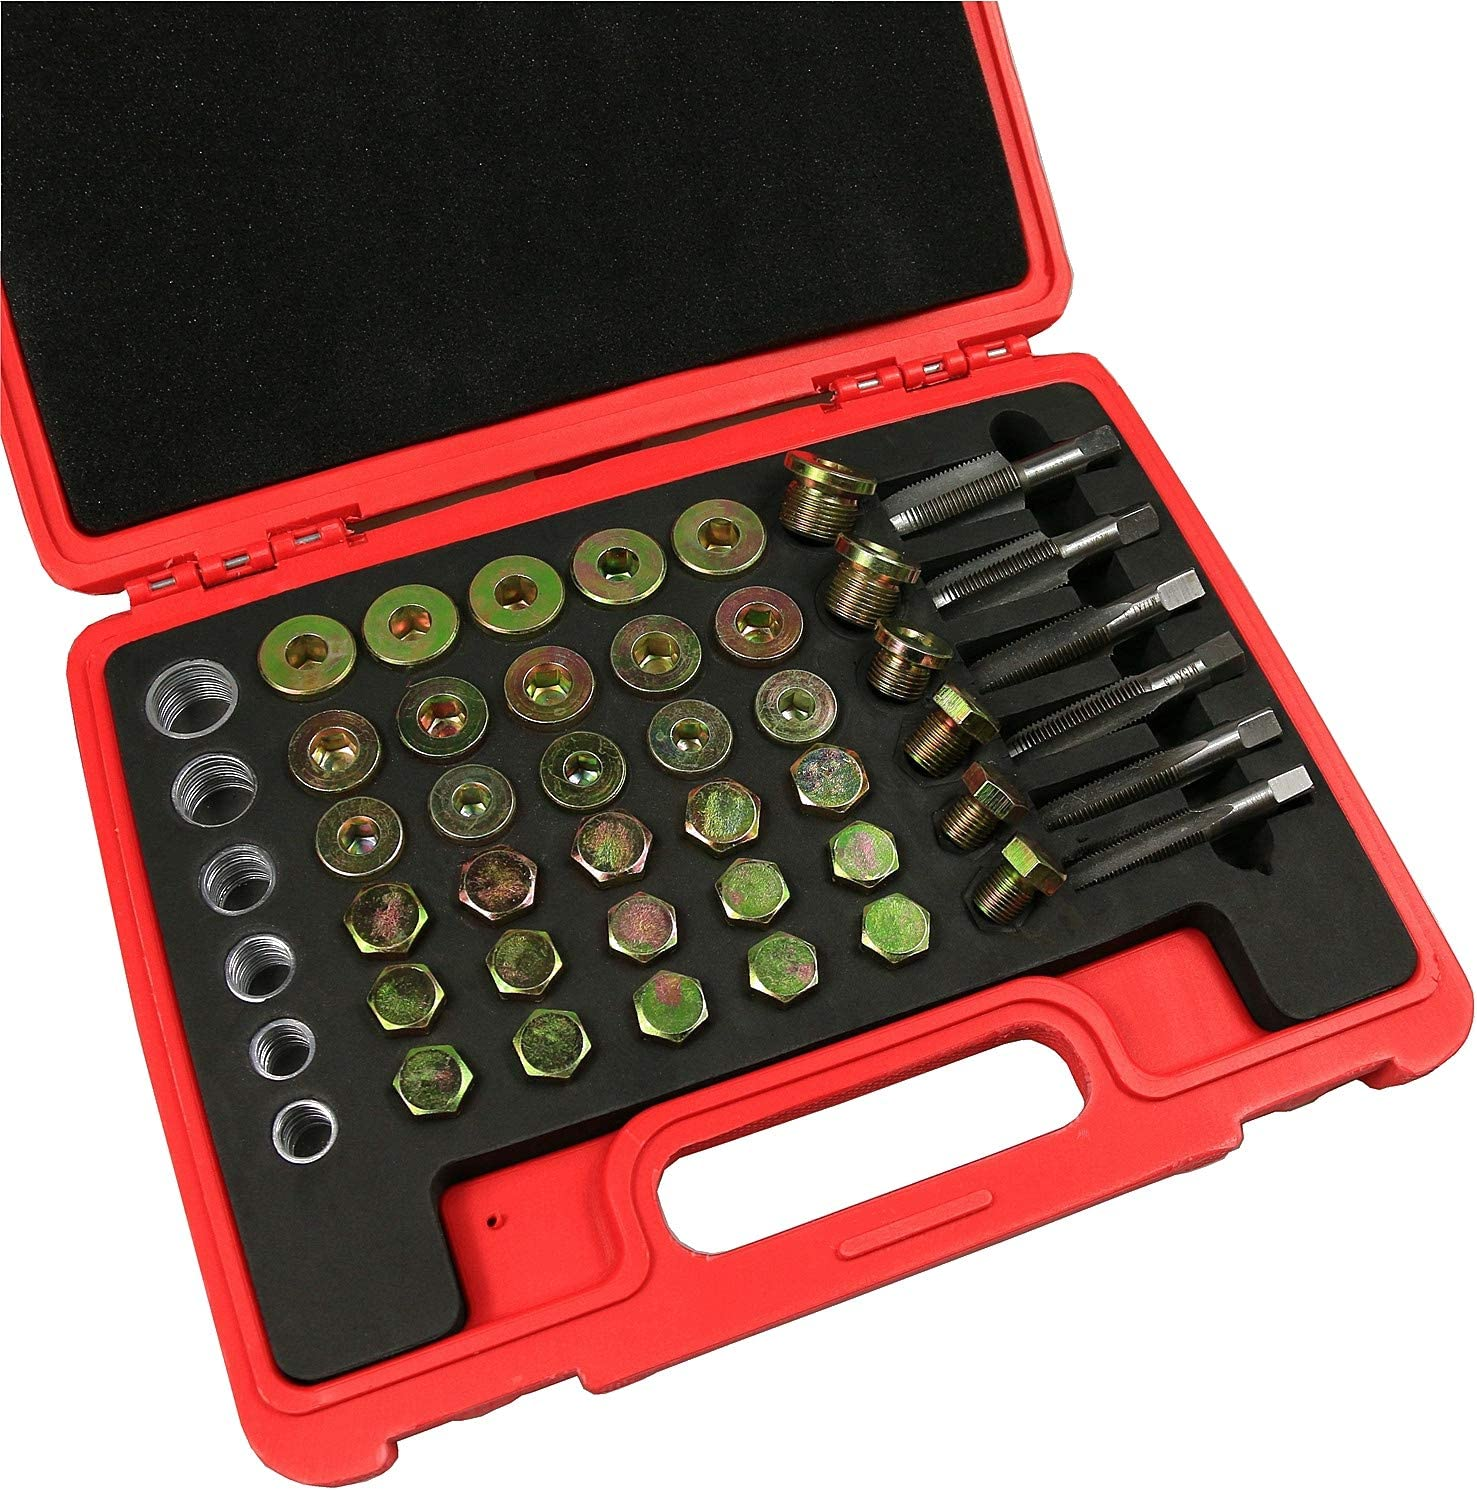 BestsQ 114pcs Oil Pan Drain Sump Plug Key Thread Repair Tool Kit Set Drain Plug with Carry Case